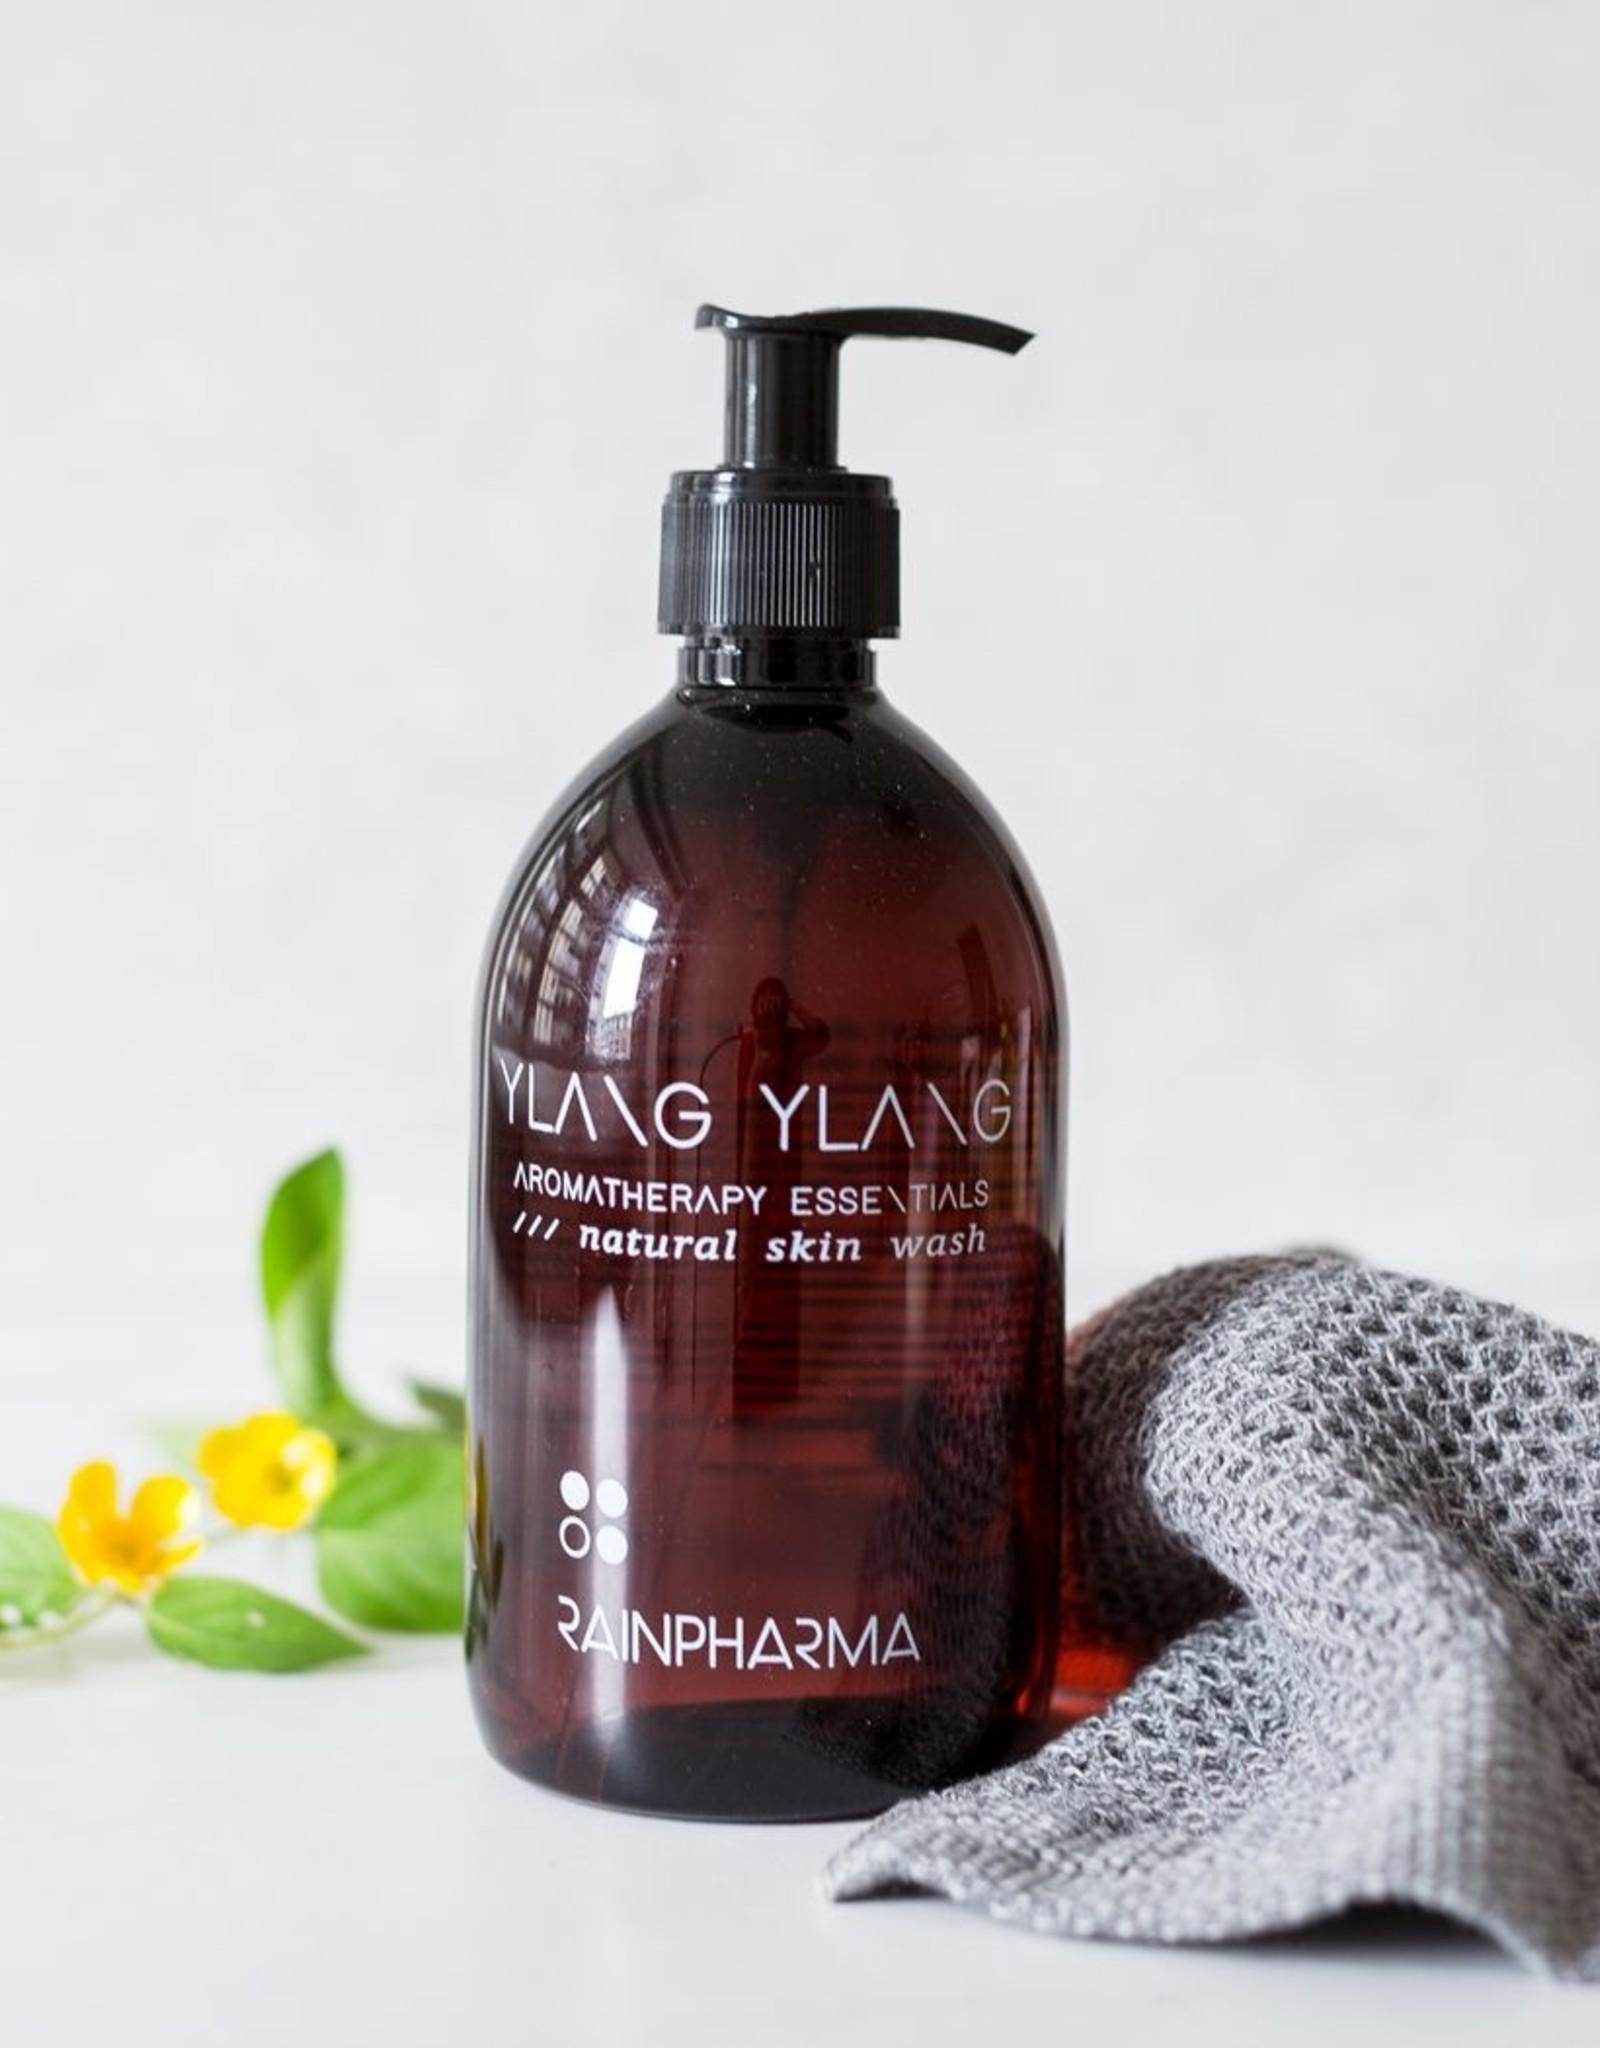 RainPharma Skin Wash Ylang Ylang 500ml - Rainpharma